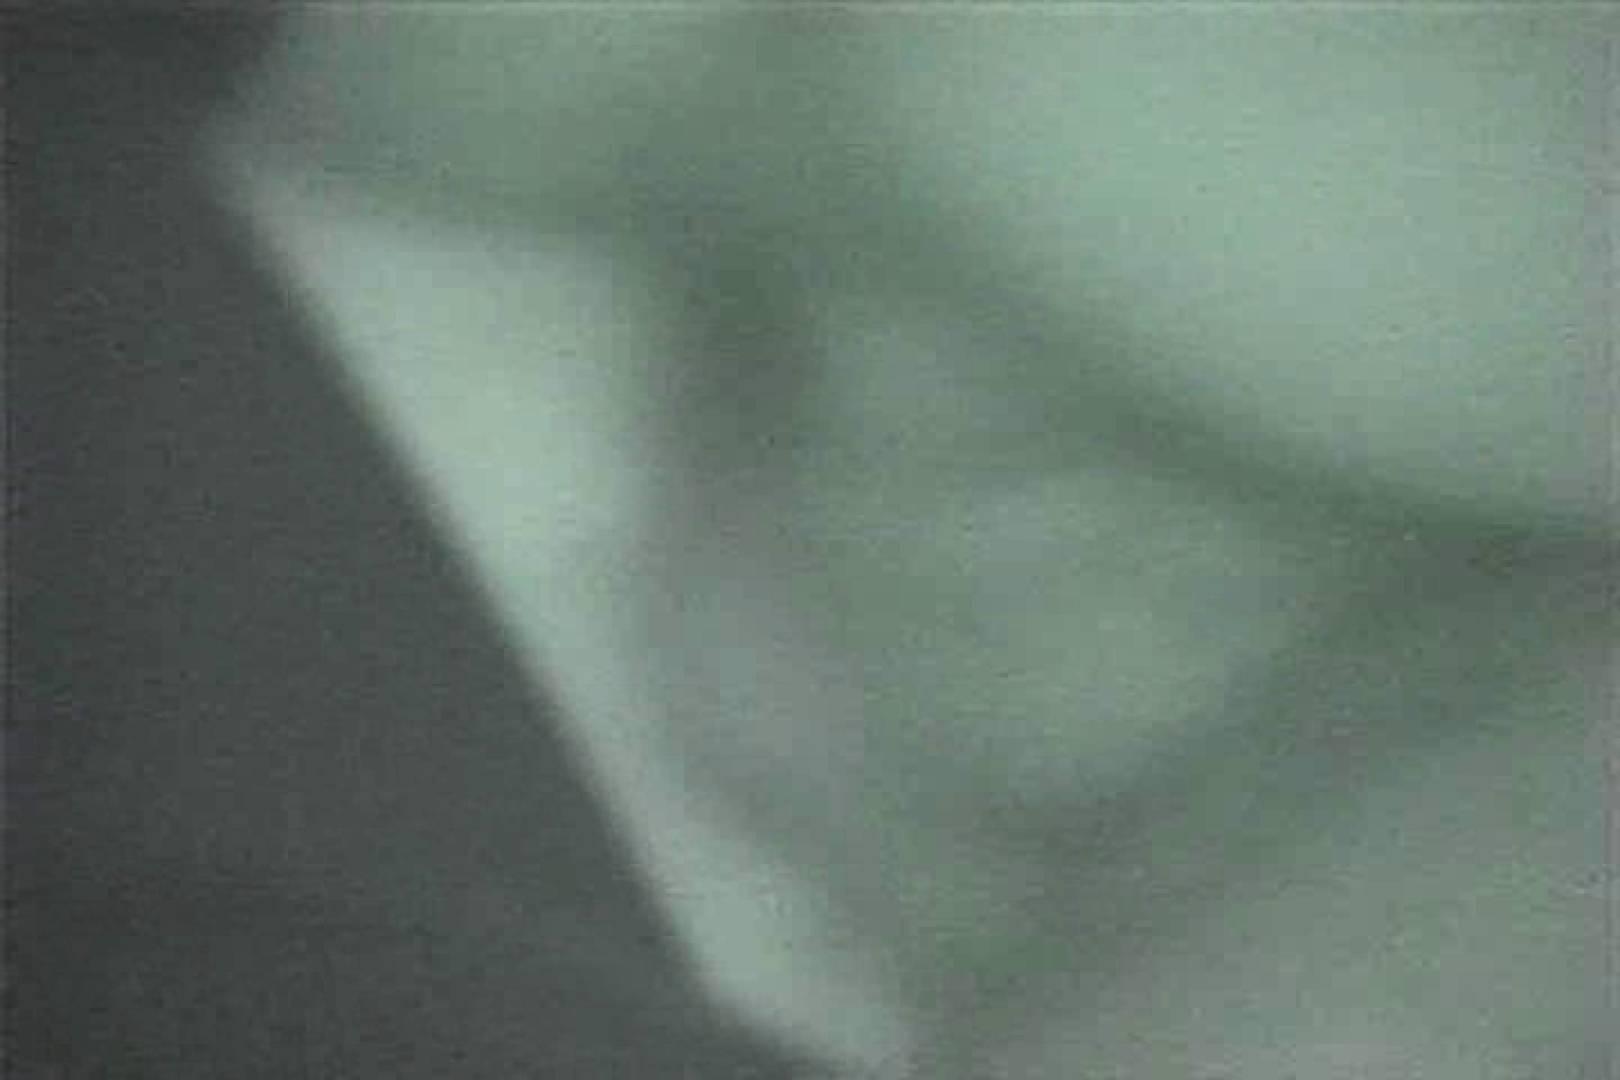 MASAさんの待ち伏せ撮り! 赤外線カーセックスVol.19 OLセックス | カップル  89画像 46